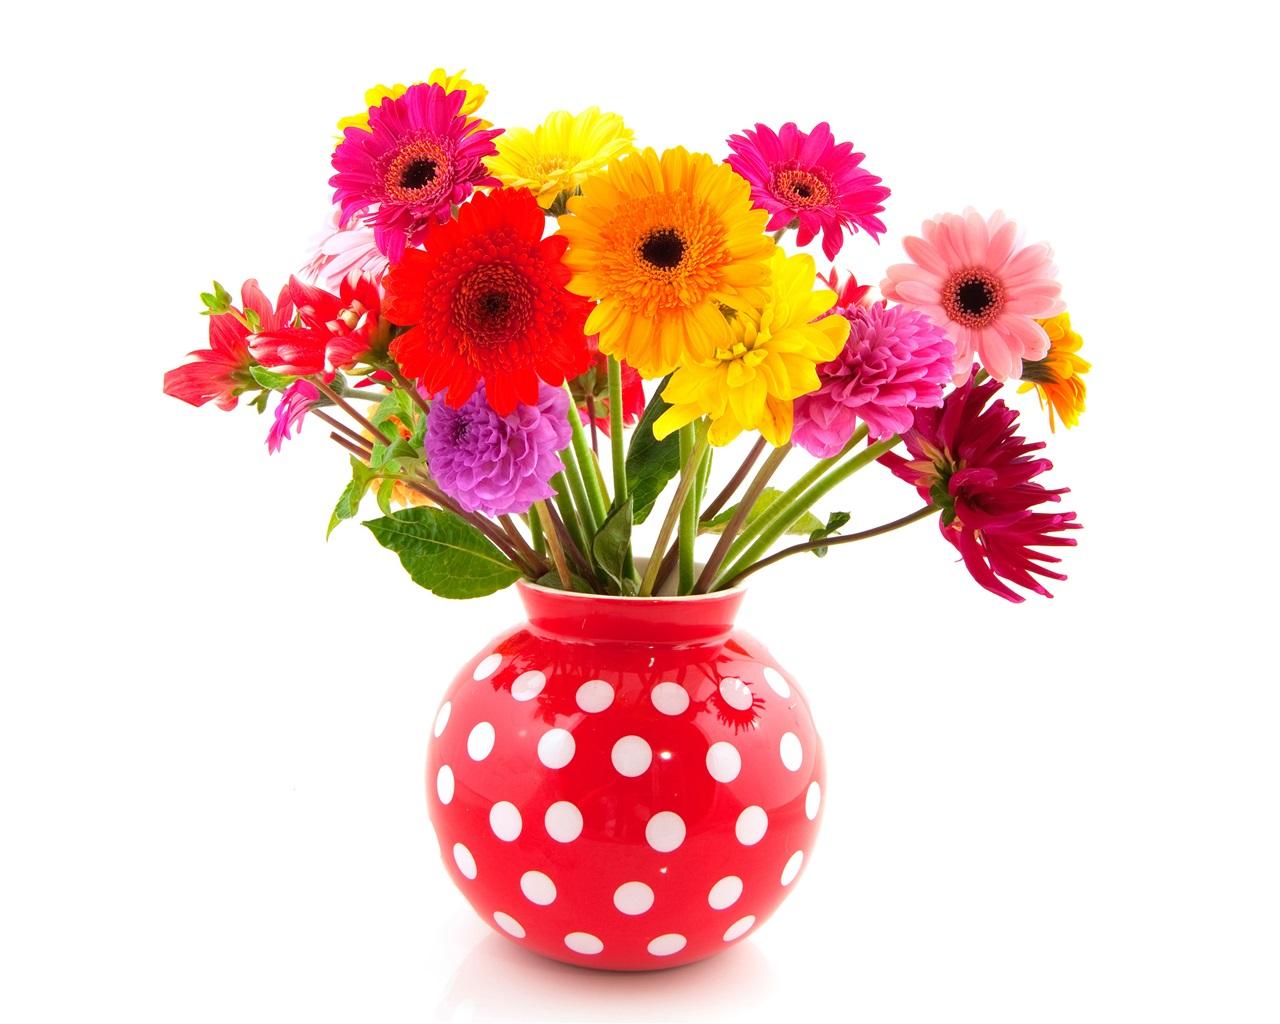 Download Wallpaper 1280x1024 Colorful Flowers, Gerbera And